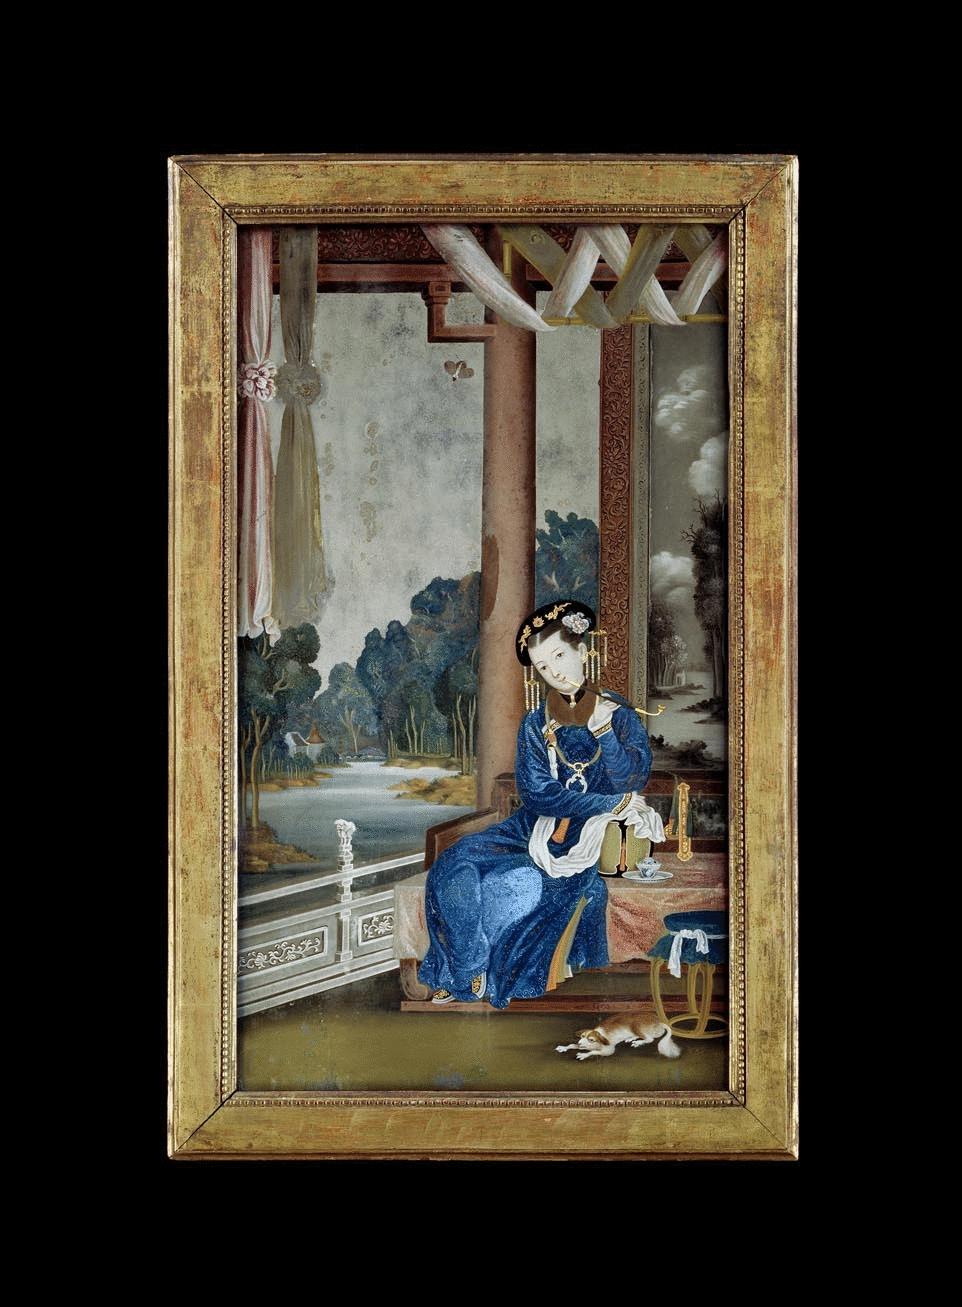 Pompeinin ölümü (resim). Ivan Konstantinovich Aivazovsky 15